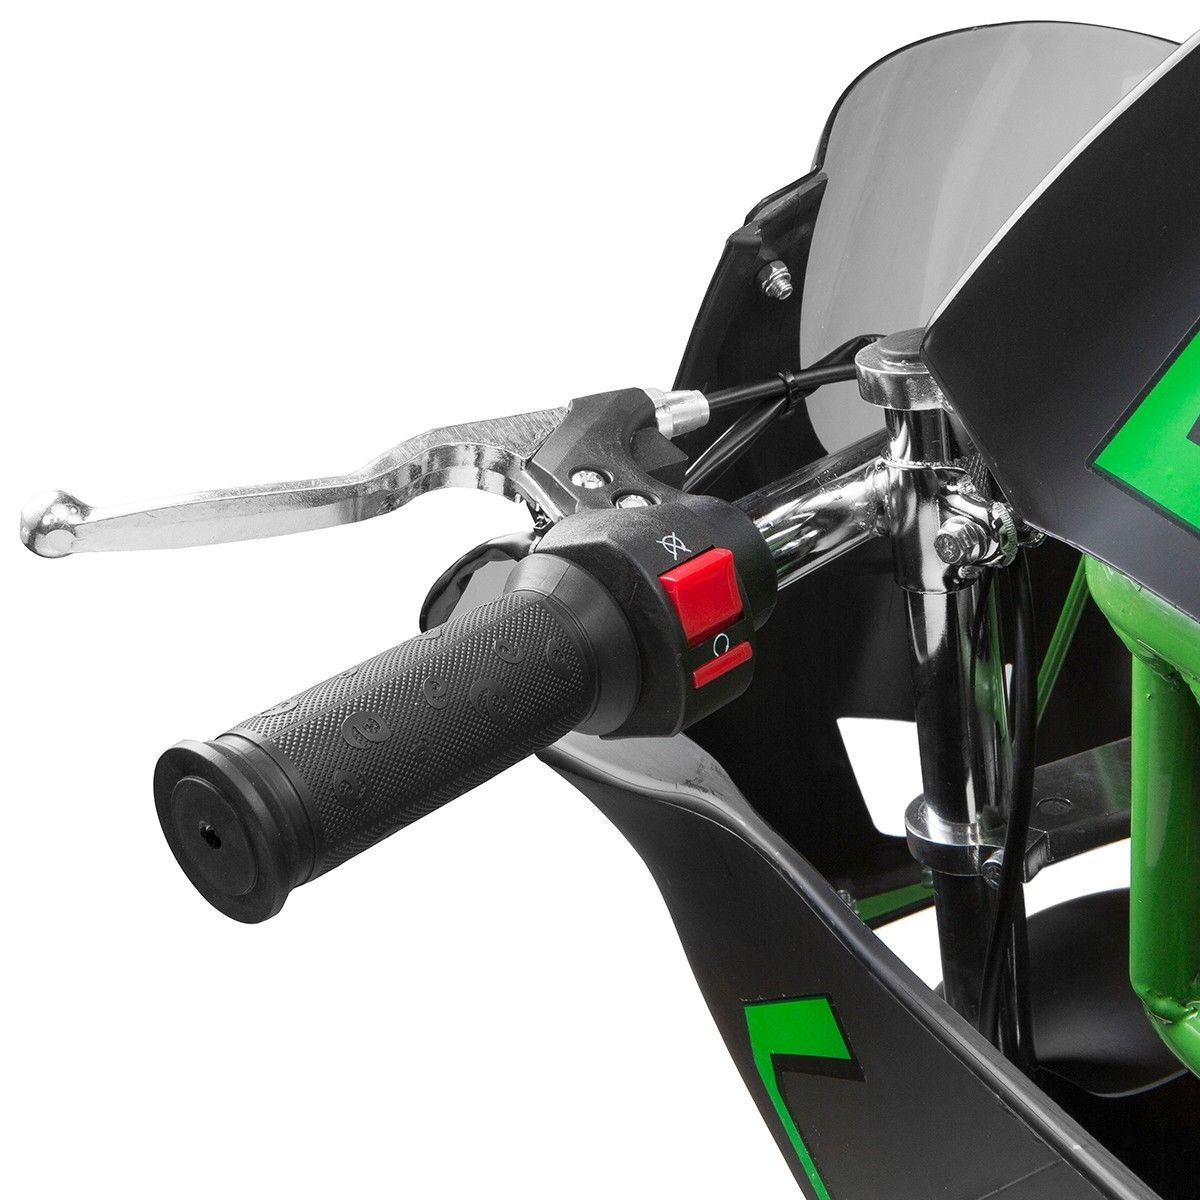 XtremepowerUS-Gas-Pocket-Bike-Motor-Bike-Scooter-40cc-Epa-Engine-Motorcycle thumbnail 16